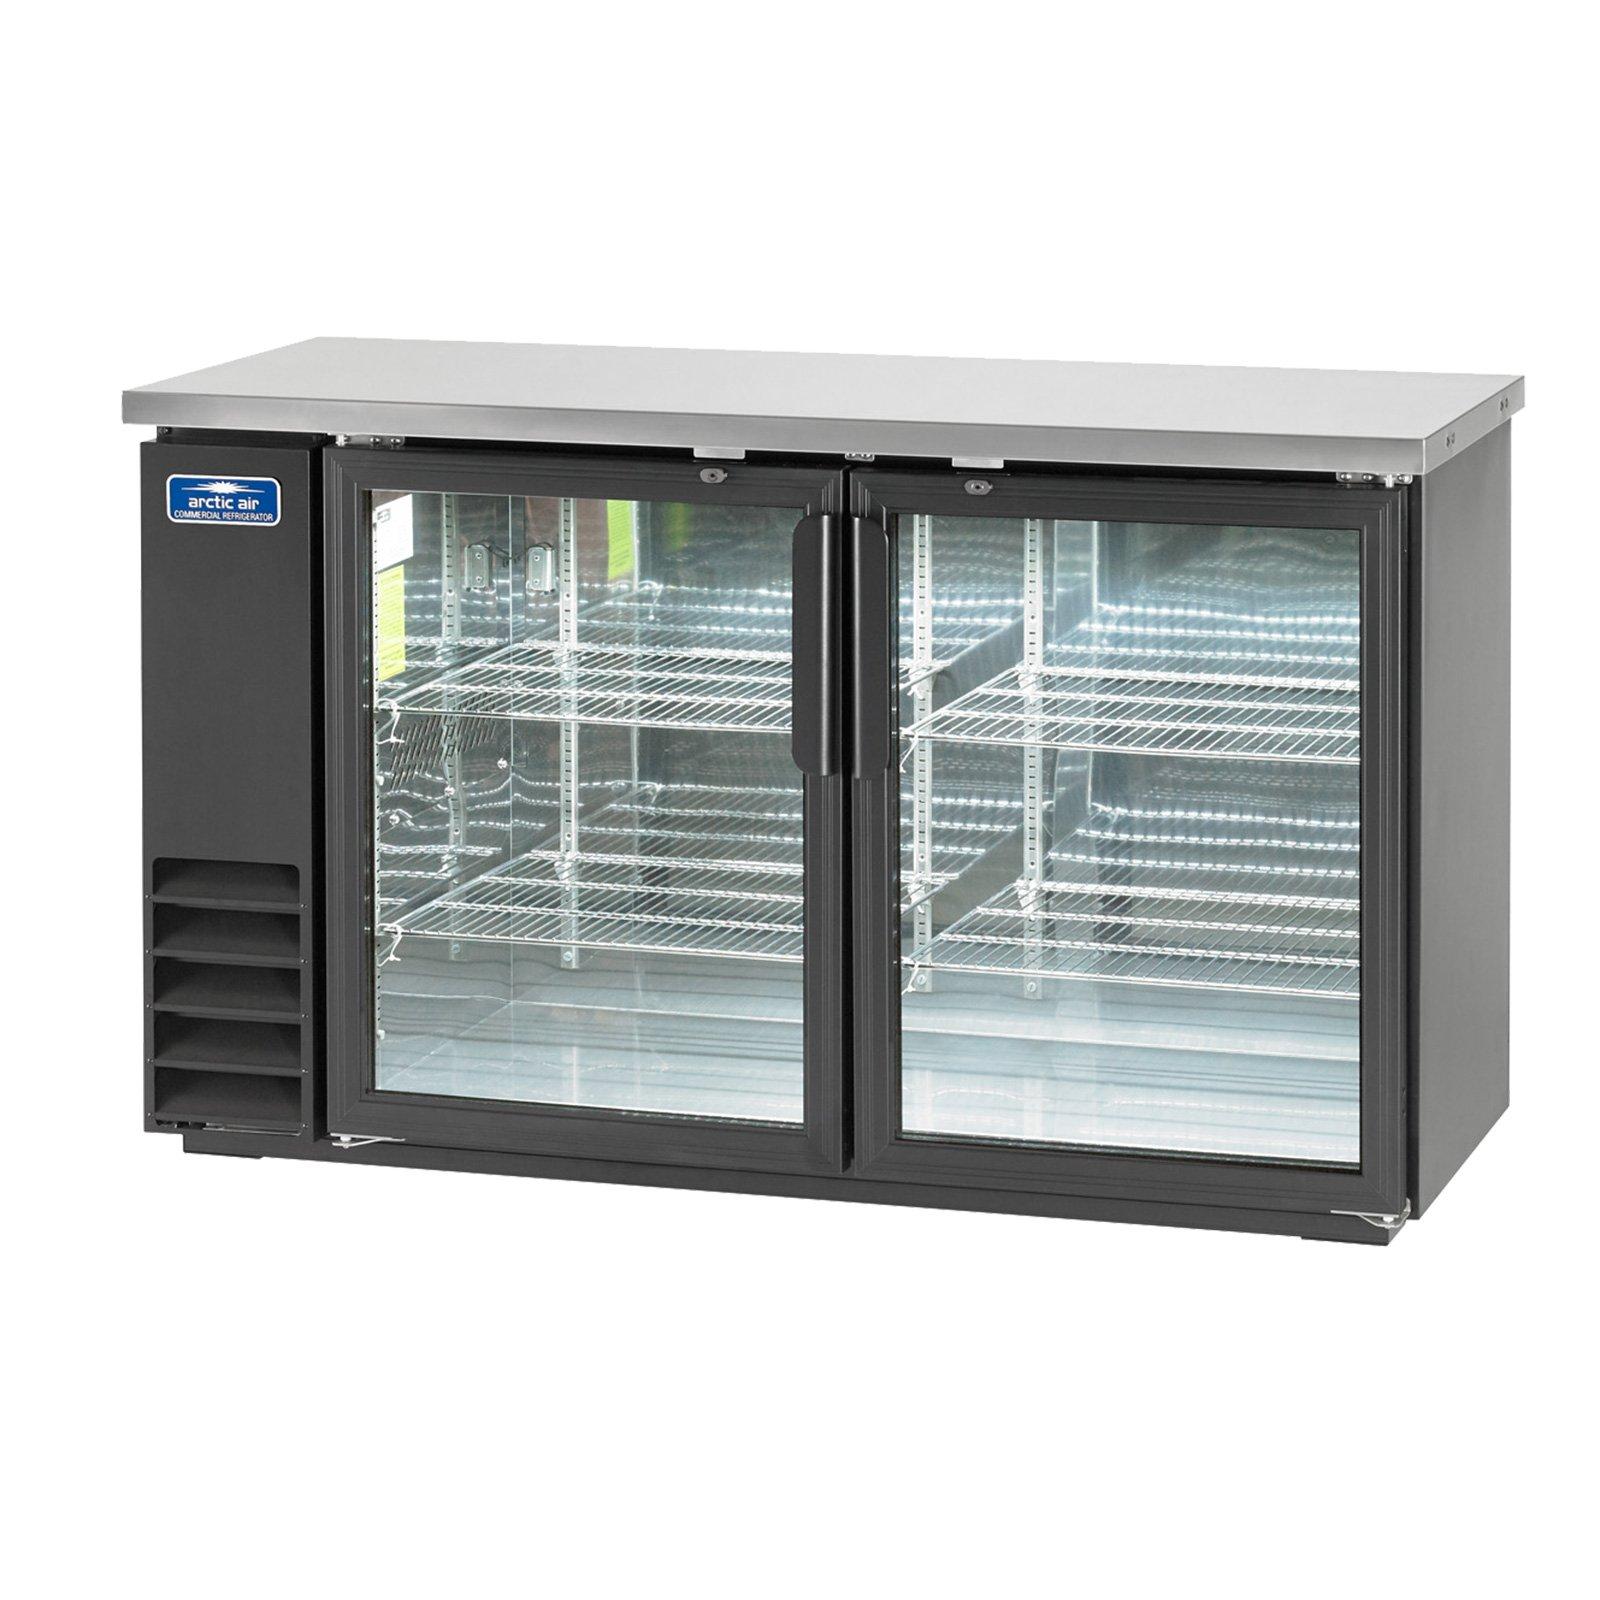 Arctic Air ABB60G Glass 61-Inch 2-Door Back Bar Refrigerator, 115v by Arctic Air